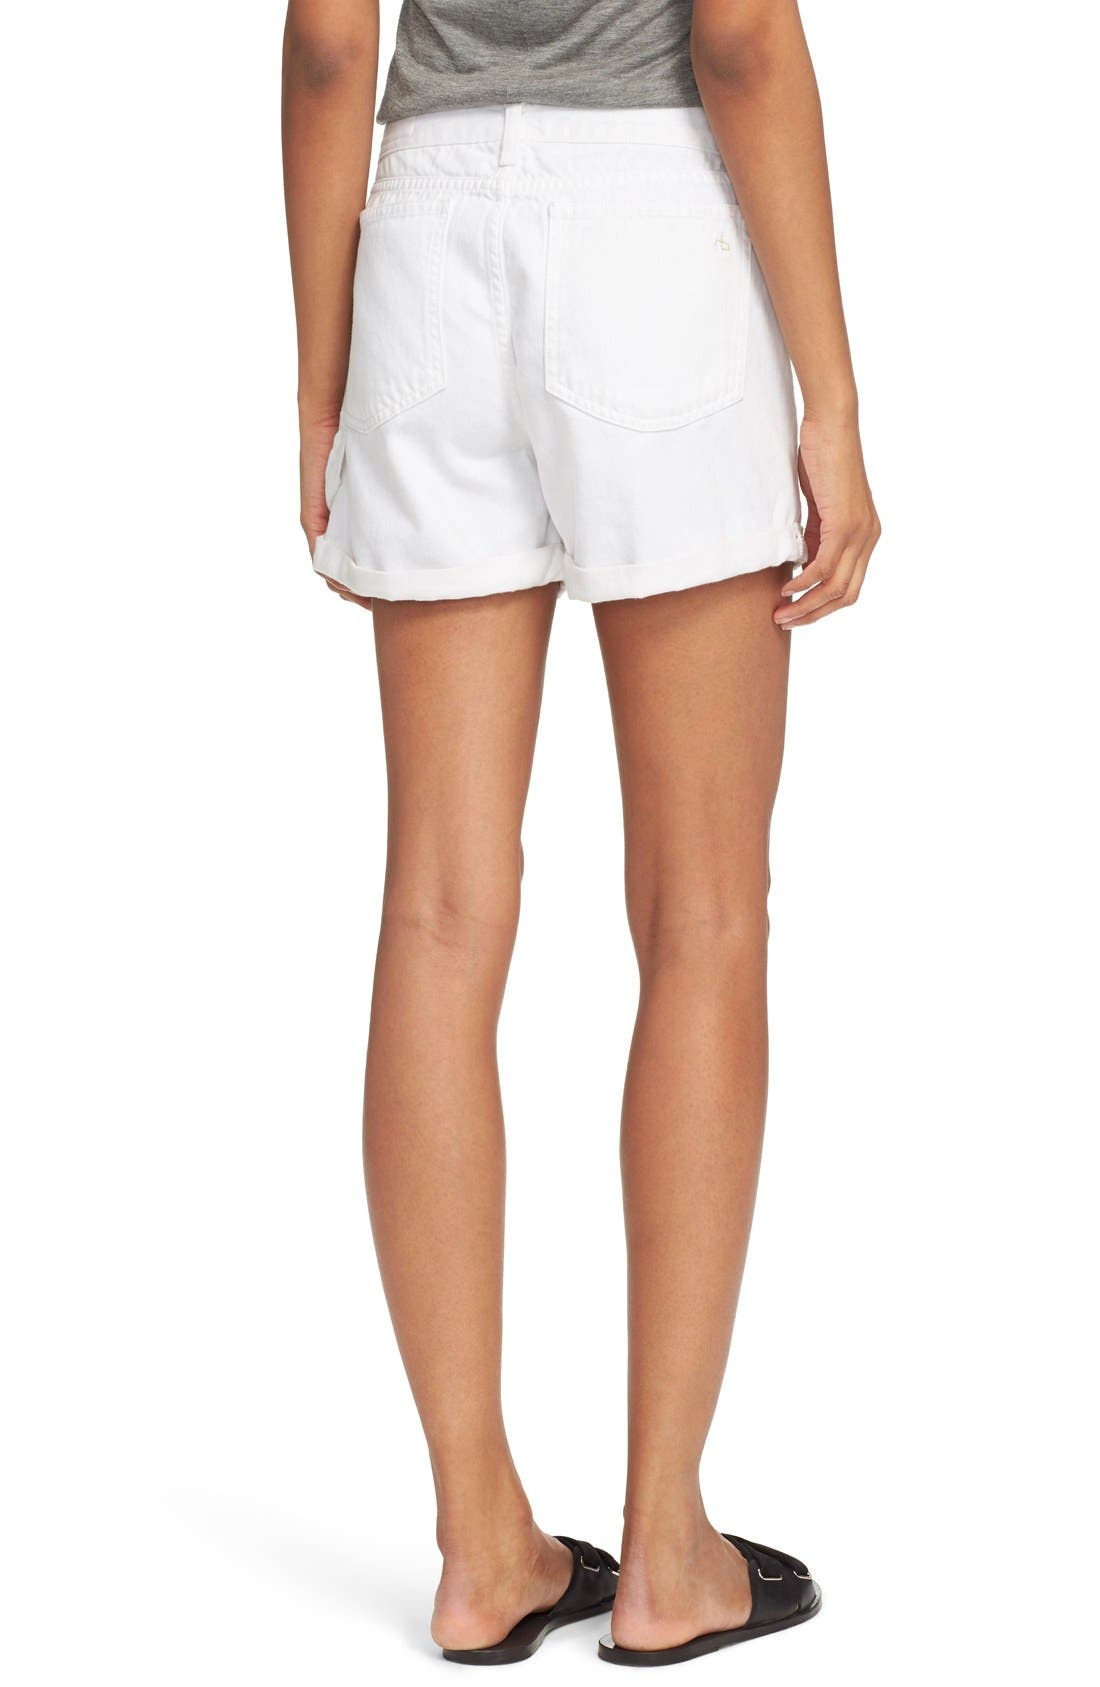 Alternate Image 2  - rag & bone/JEAN 'Carpenter' Cuffed Denim Shorts (Aged Bright White)